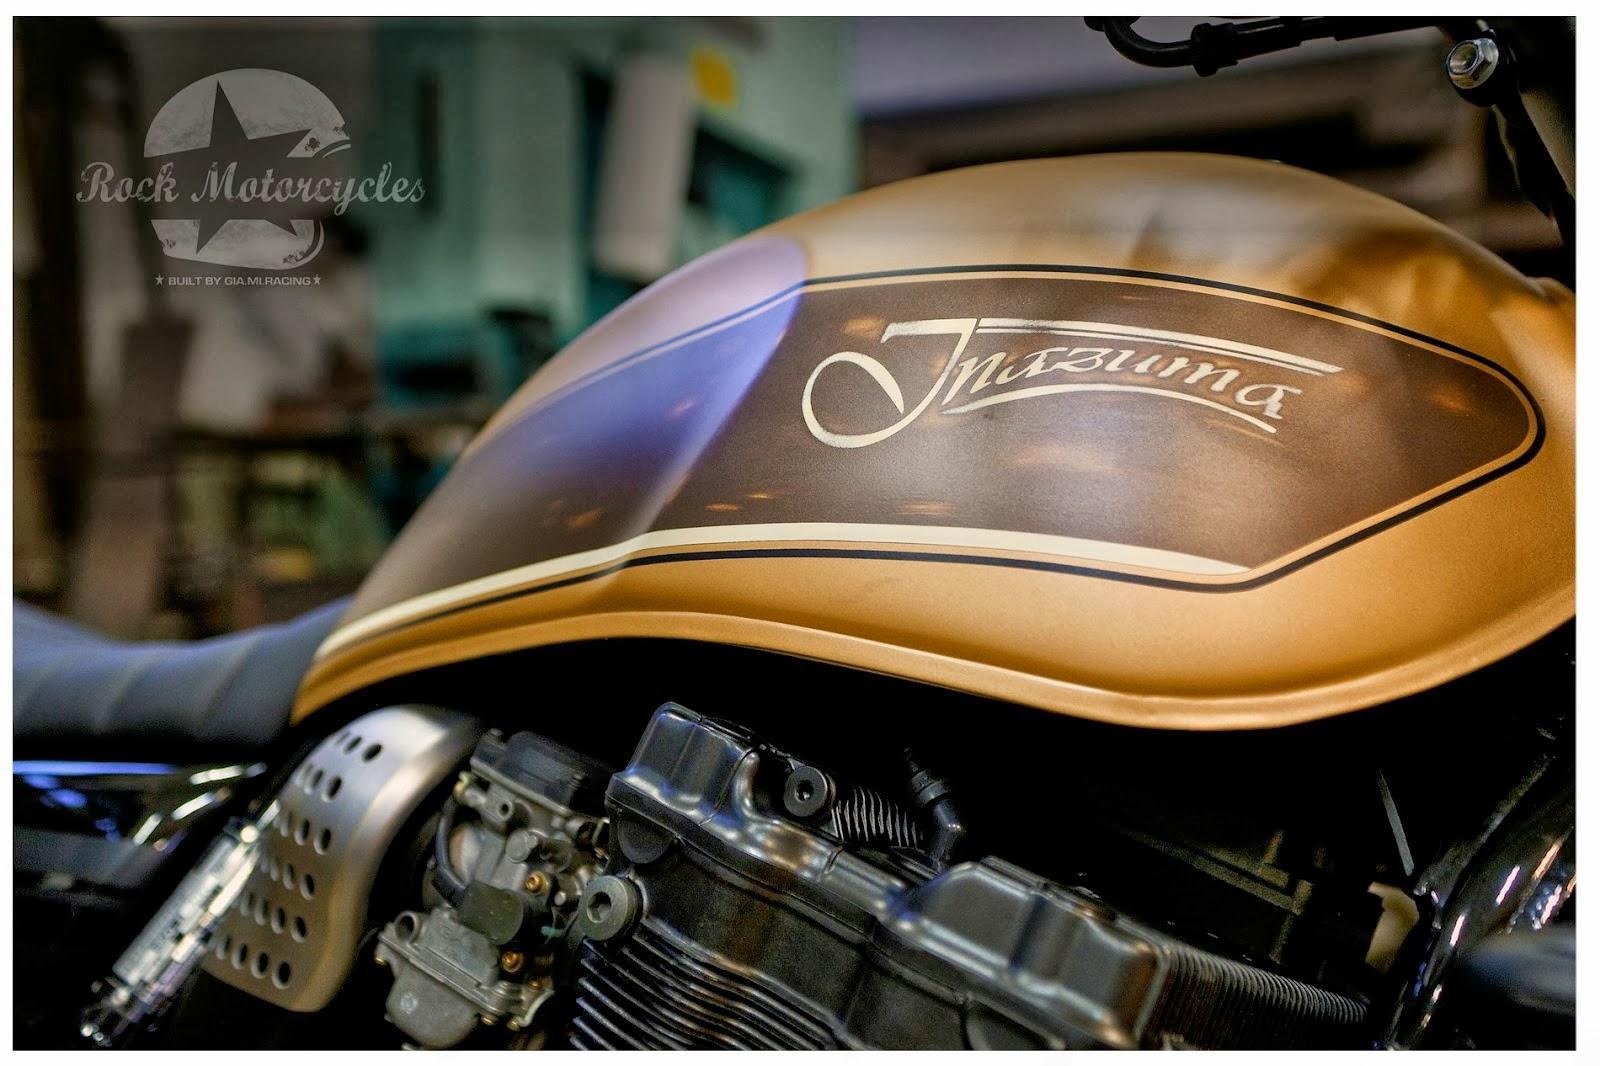 Milchapitas Kustom Bikes Suzuki Inazuma 750 By Rock